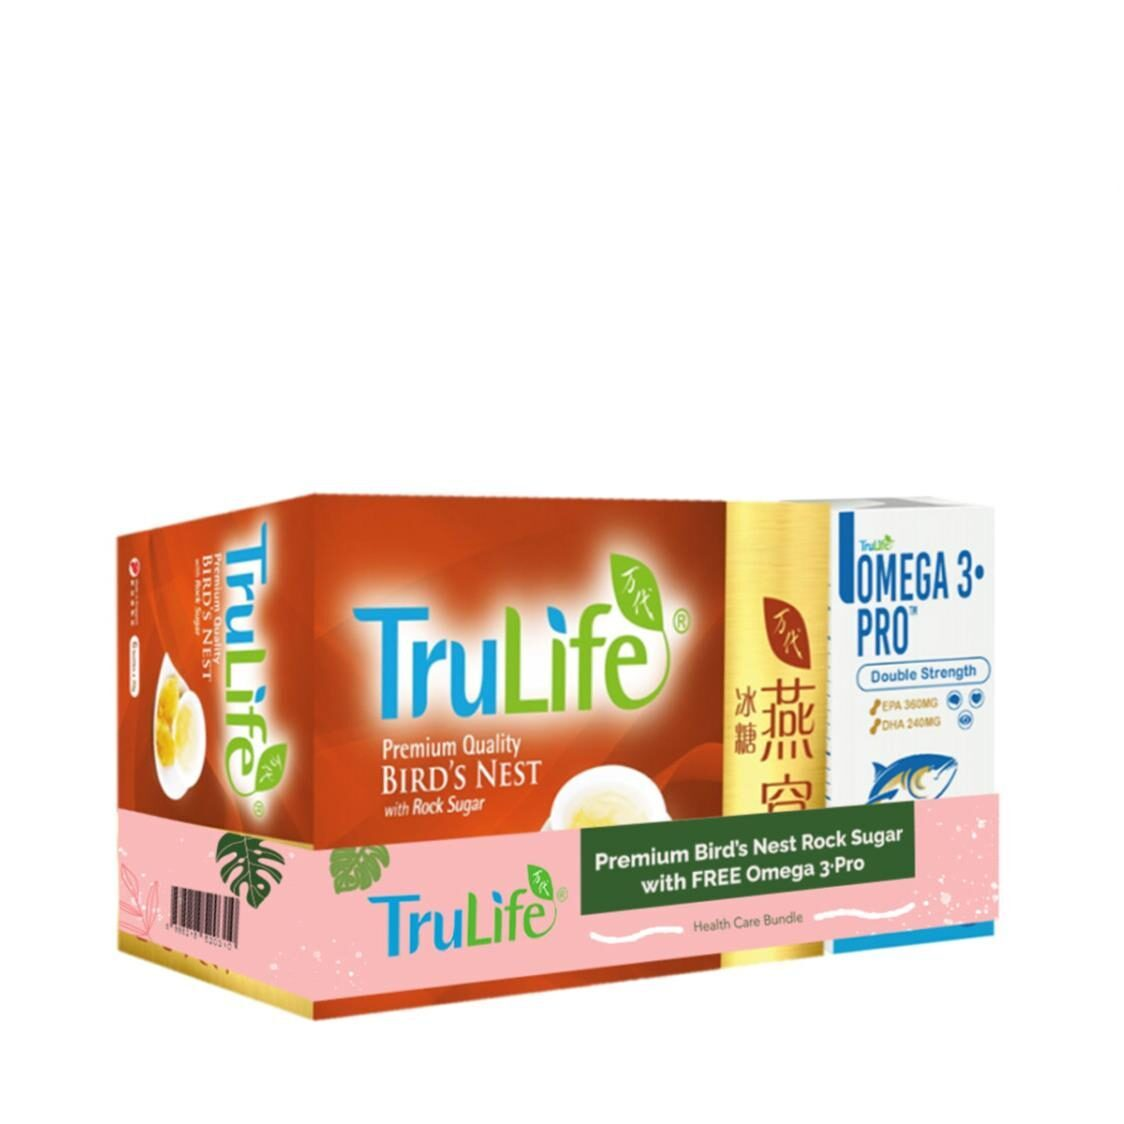 TruLife Birds Nest Rock Sugar 6s   Omega 3Pro 60s Bundle